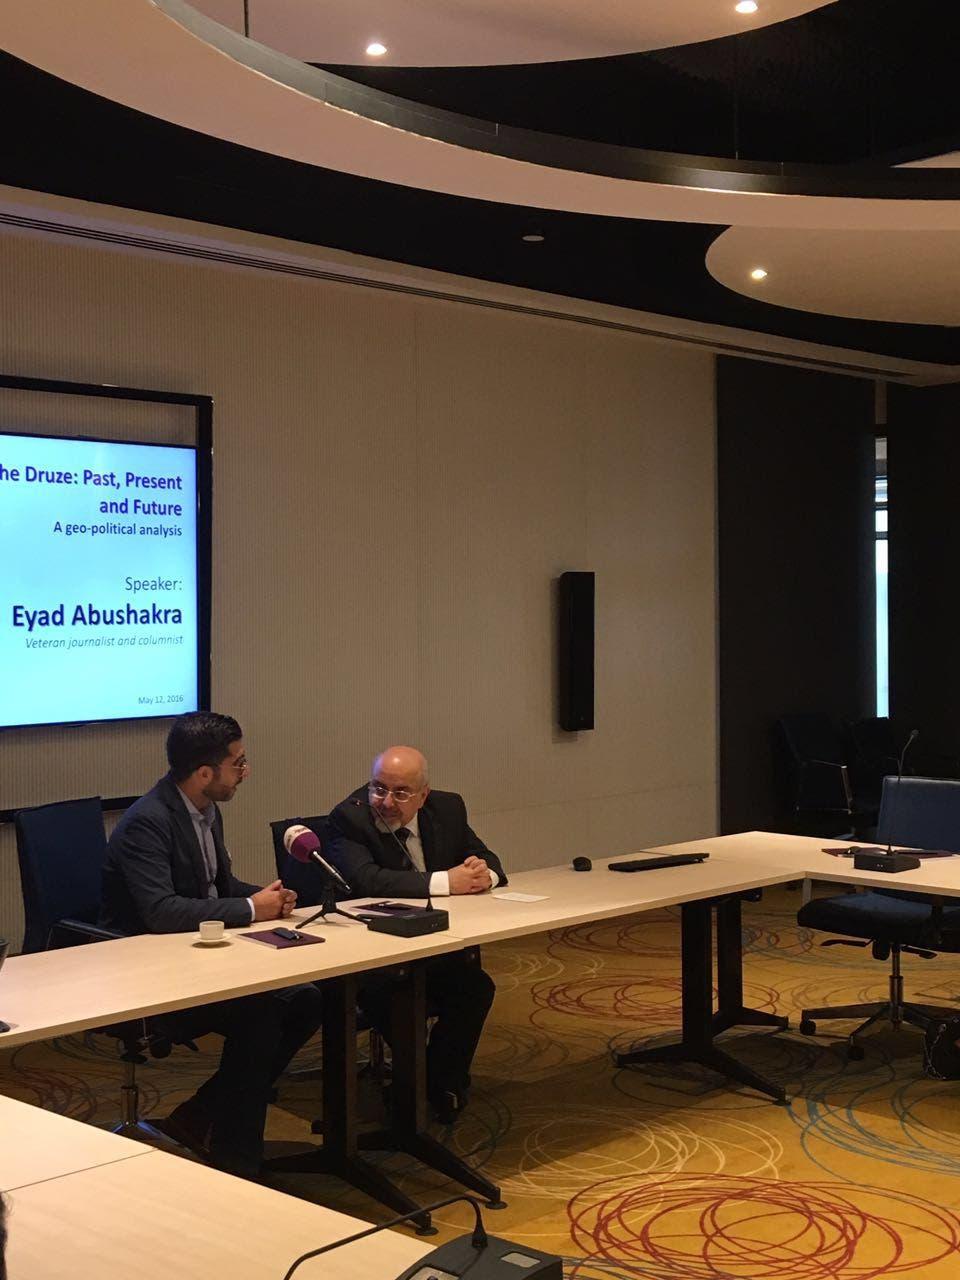 Al Arabiya English Editor-in-Chief Faisal J. Abbas (L) thanks Druze expert Eyad Abu Shakra at the end of the discussion centering on the minority group. (Al Arabiya English)